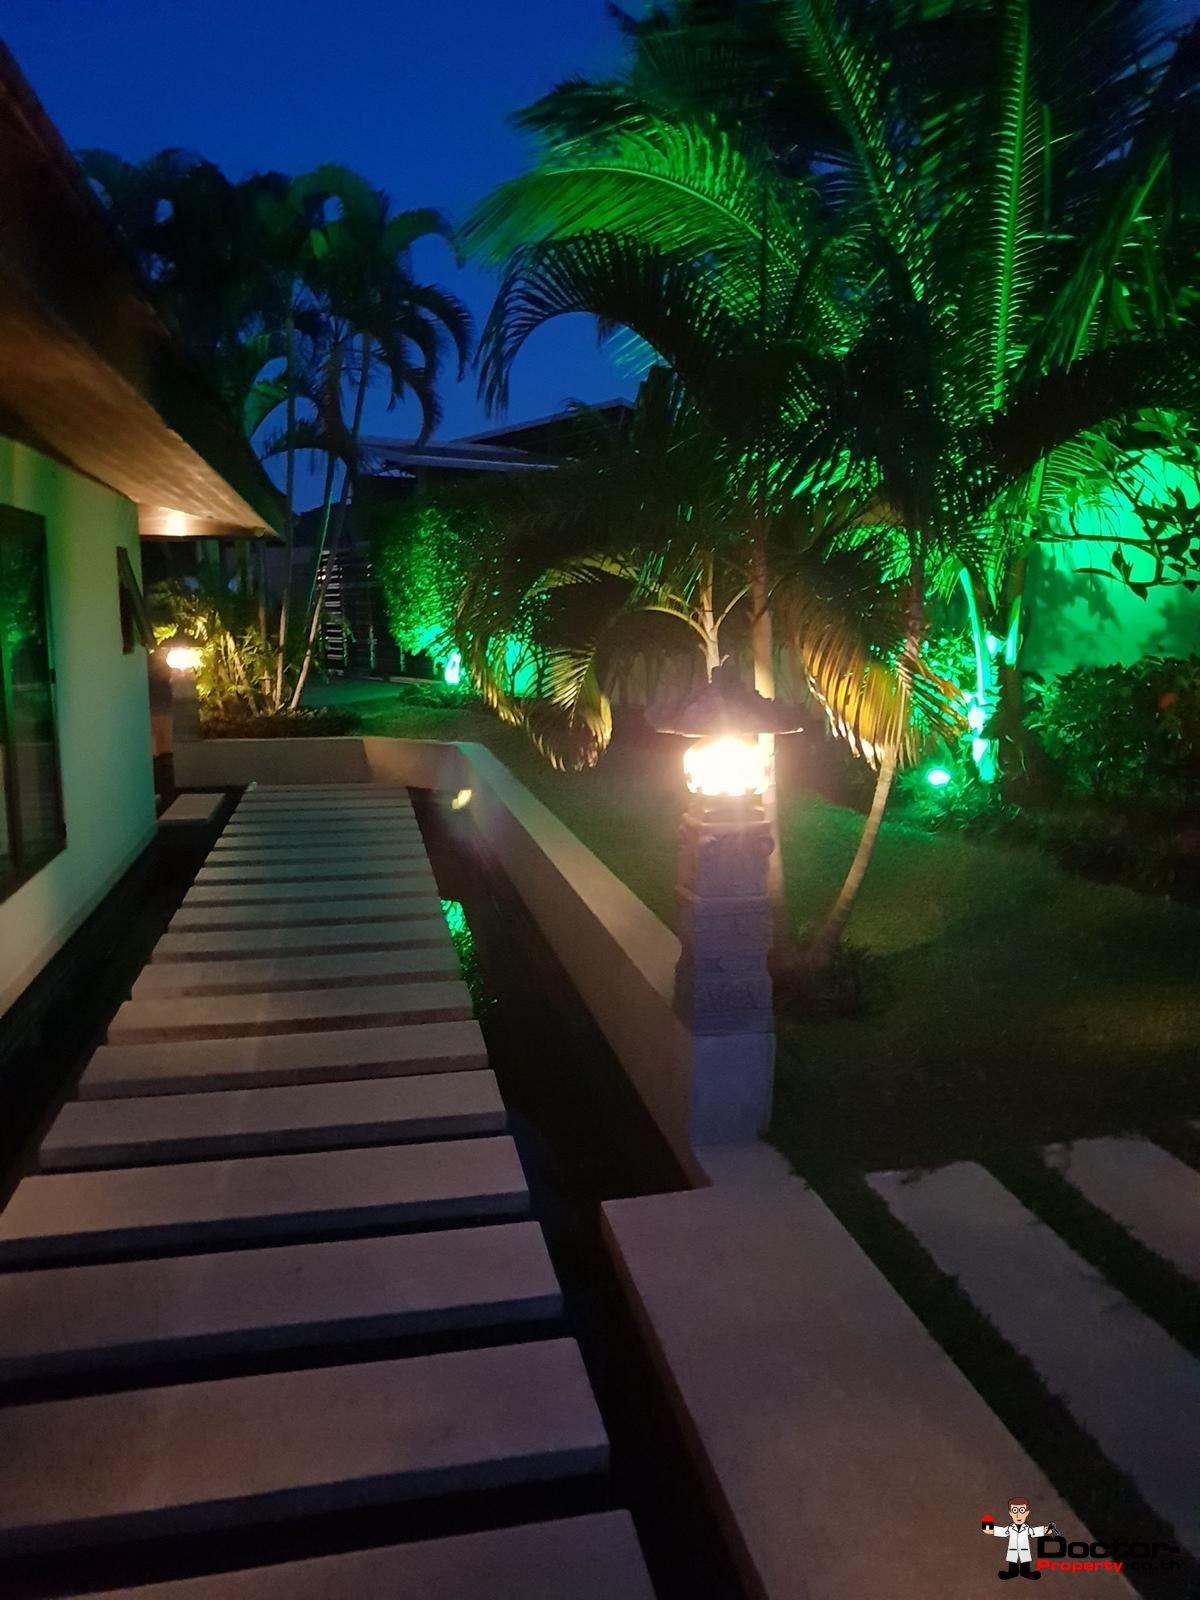 6 Bedroom Villa with Sea View - Bophut - Koh Samui - for sale 14